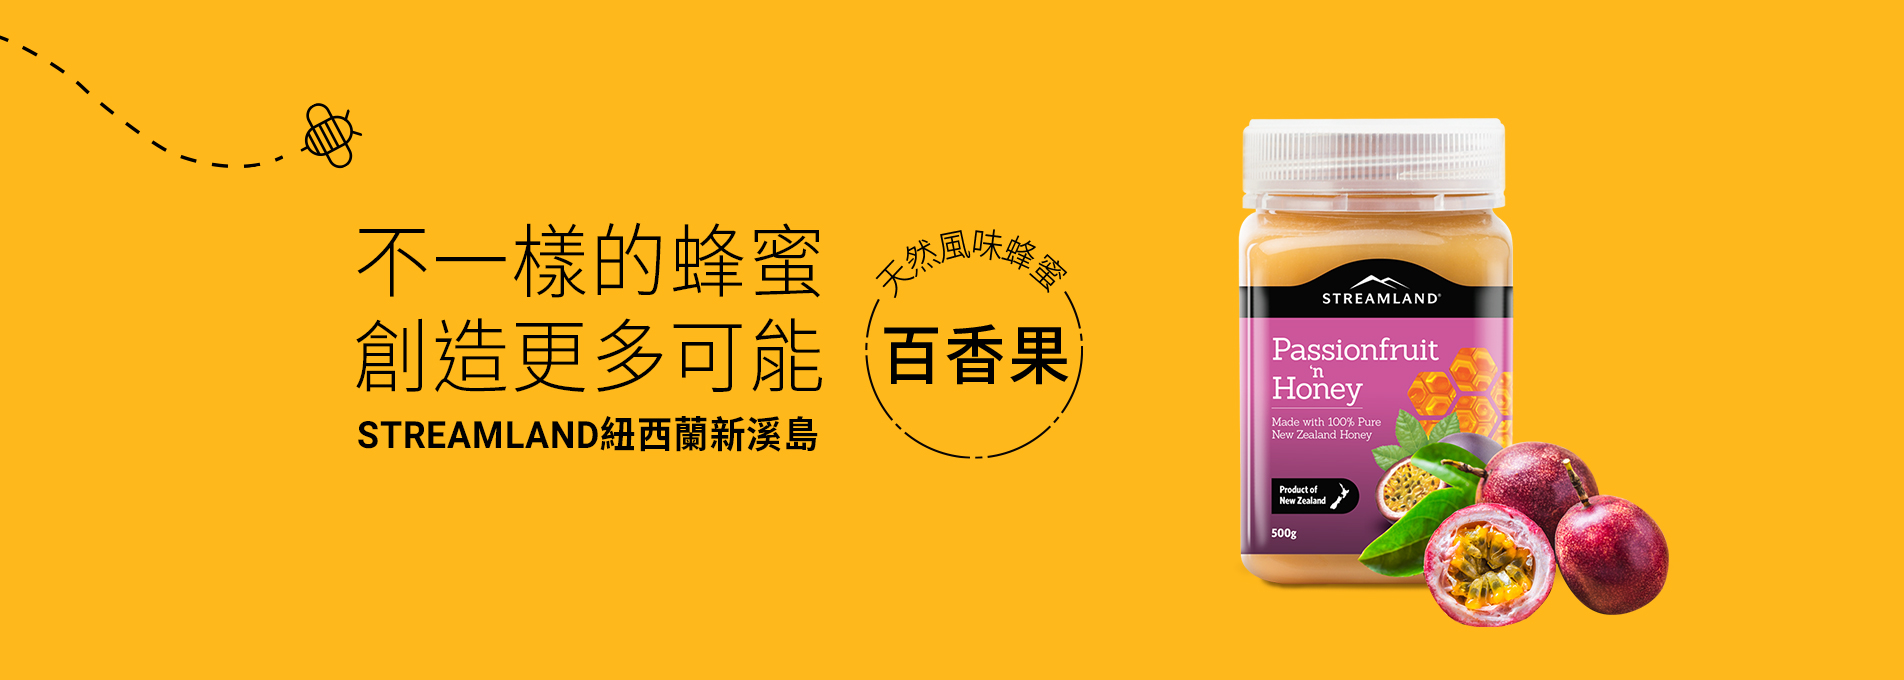 STREAMLAND紐西蘭新溪島 風味蜂蜜-百香果 500g